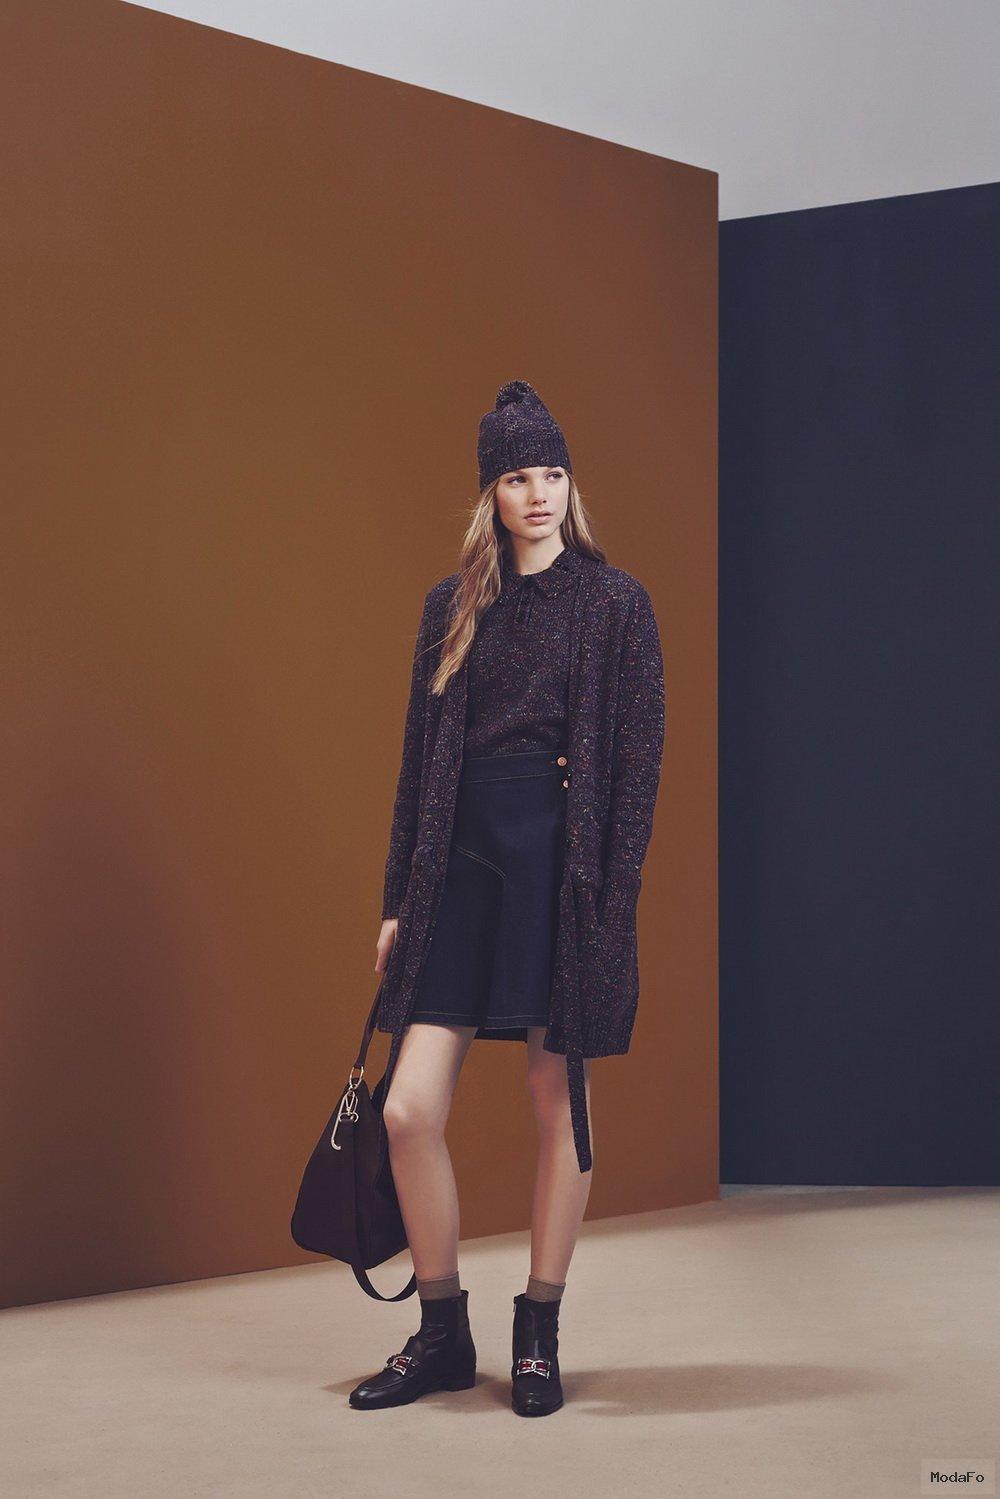 See-by-Chloé-Fall-Winter-2015- ... - Uzun hırka modelleri Uzun Hırka Kombinleri Uzun Hırka Modası Uzun Kış Modası Hırka Kombinleri